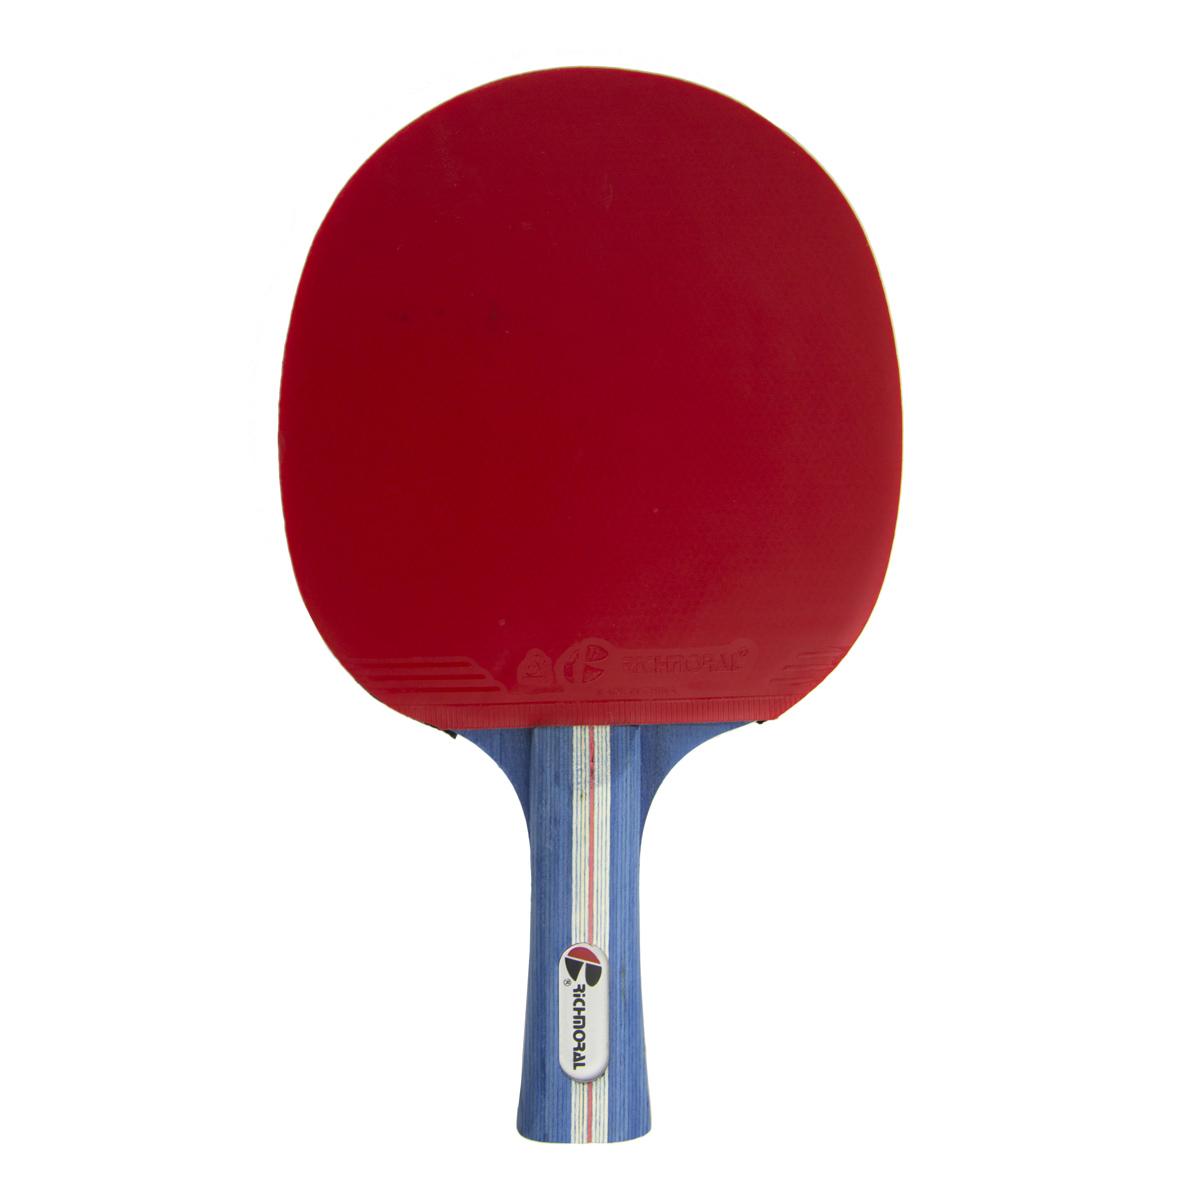 Pálka na stolní tenis RICHMORAL Premium 4*